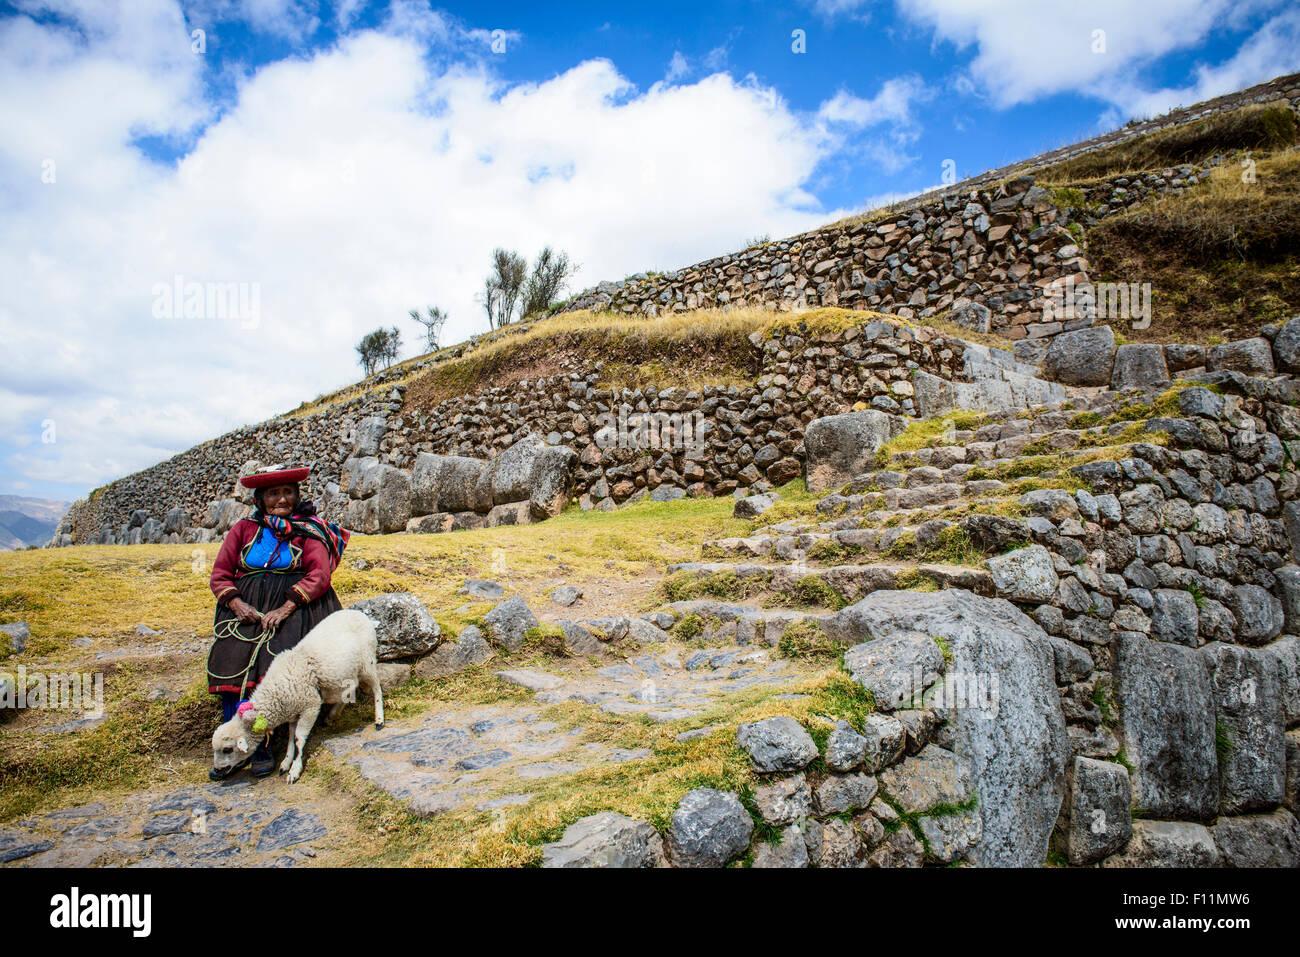 Older Hispanic woman walking llama on stone steps - Stock Image